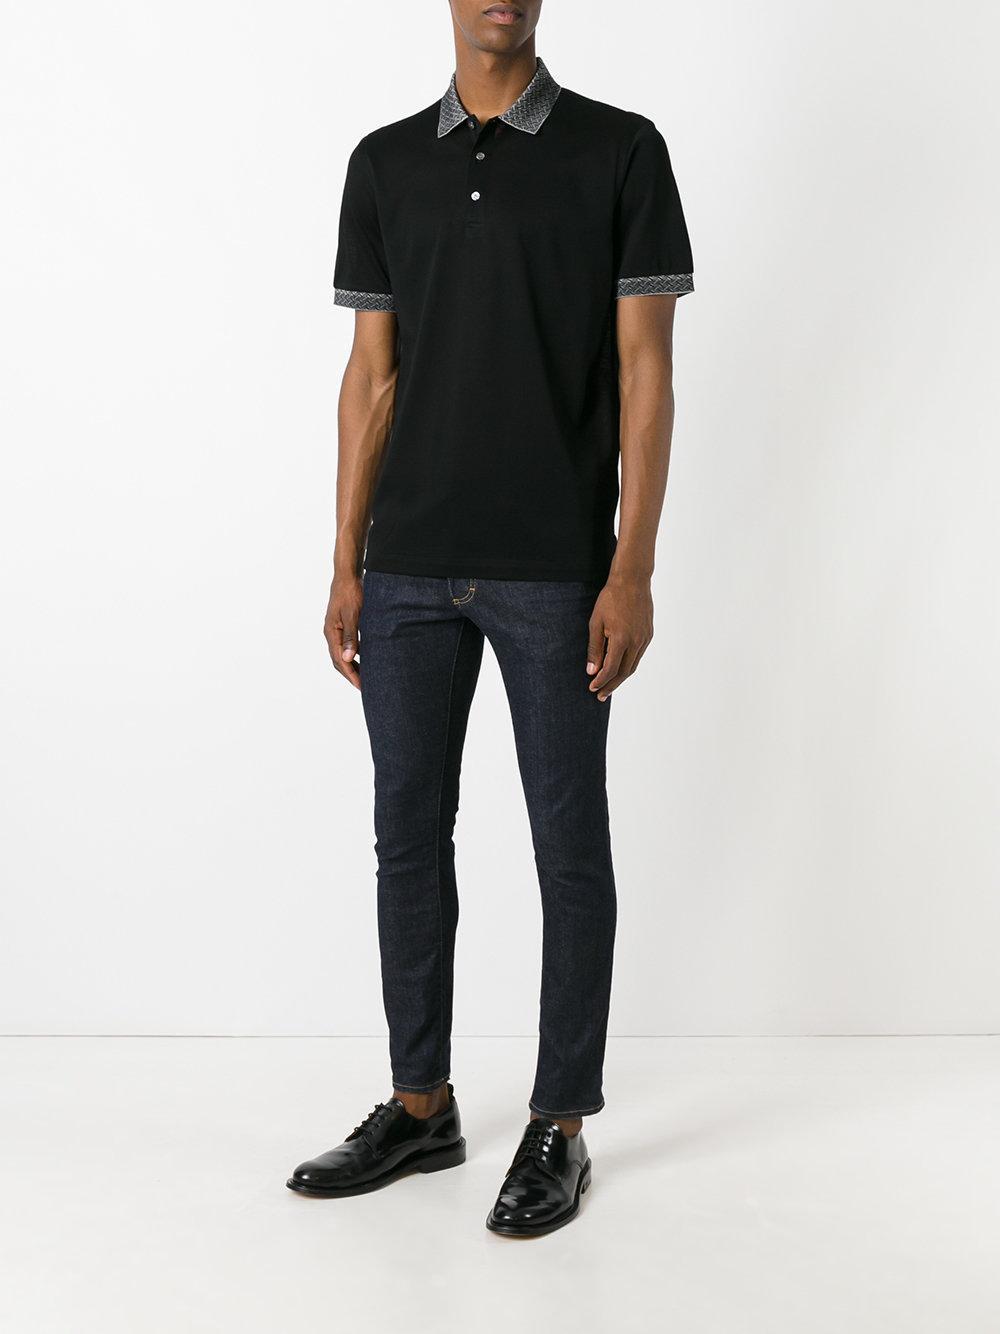 Brioni Cotton Collar Detail Polo Shirt in Black for Men